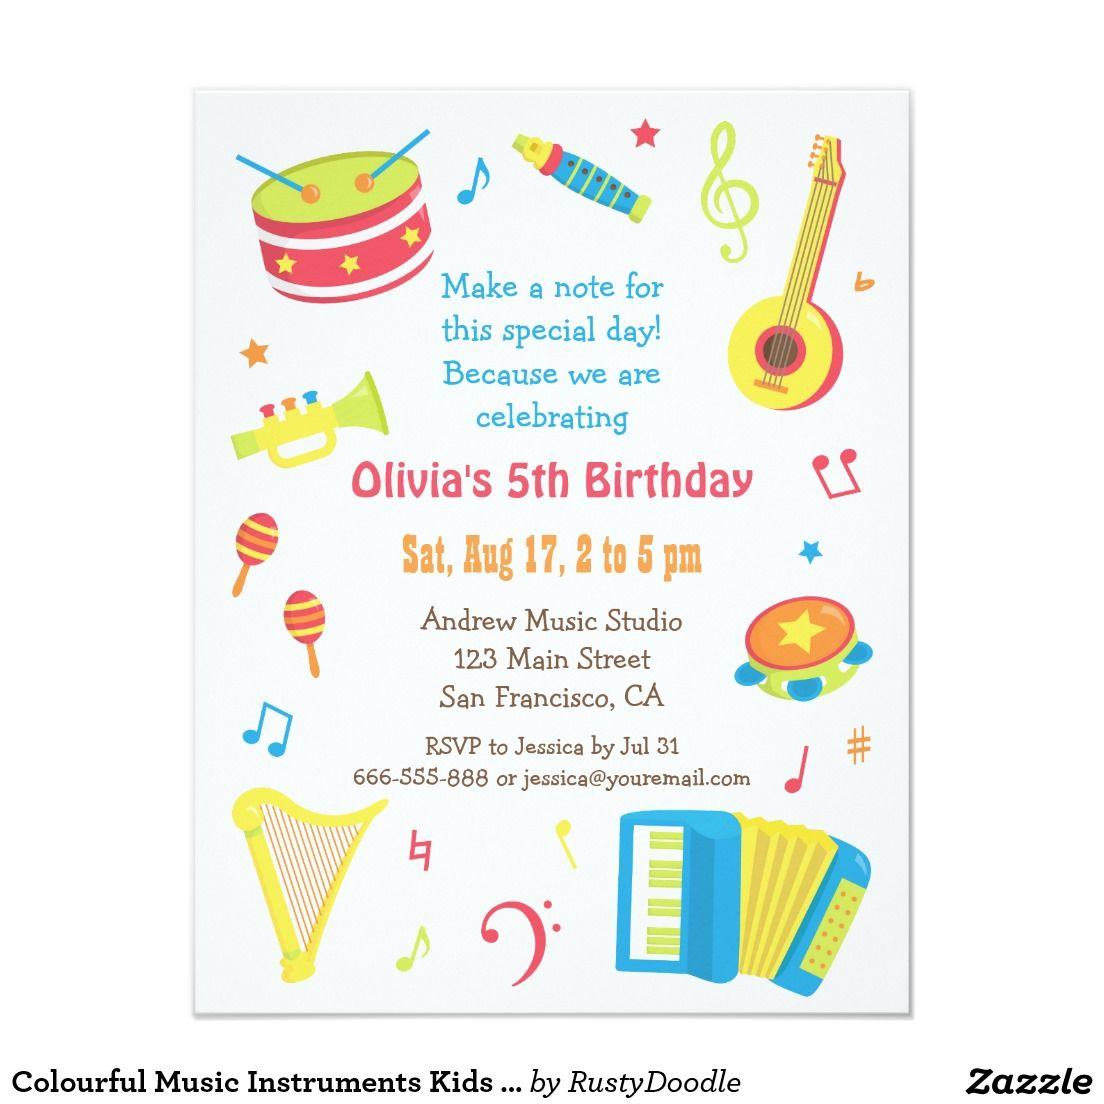 Colourful music instruments kids birthday party invitation party colourful music instruments kids birthday party 425x55 paper invitation card filmwisefo